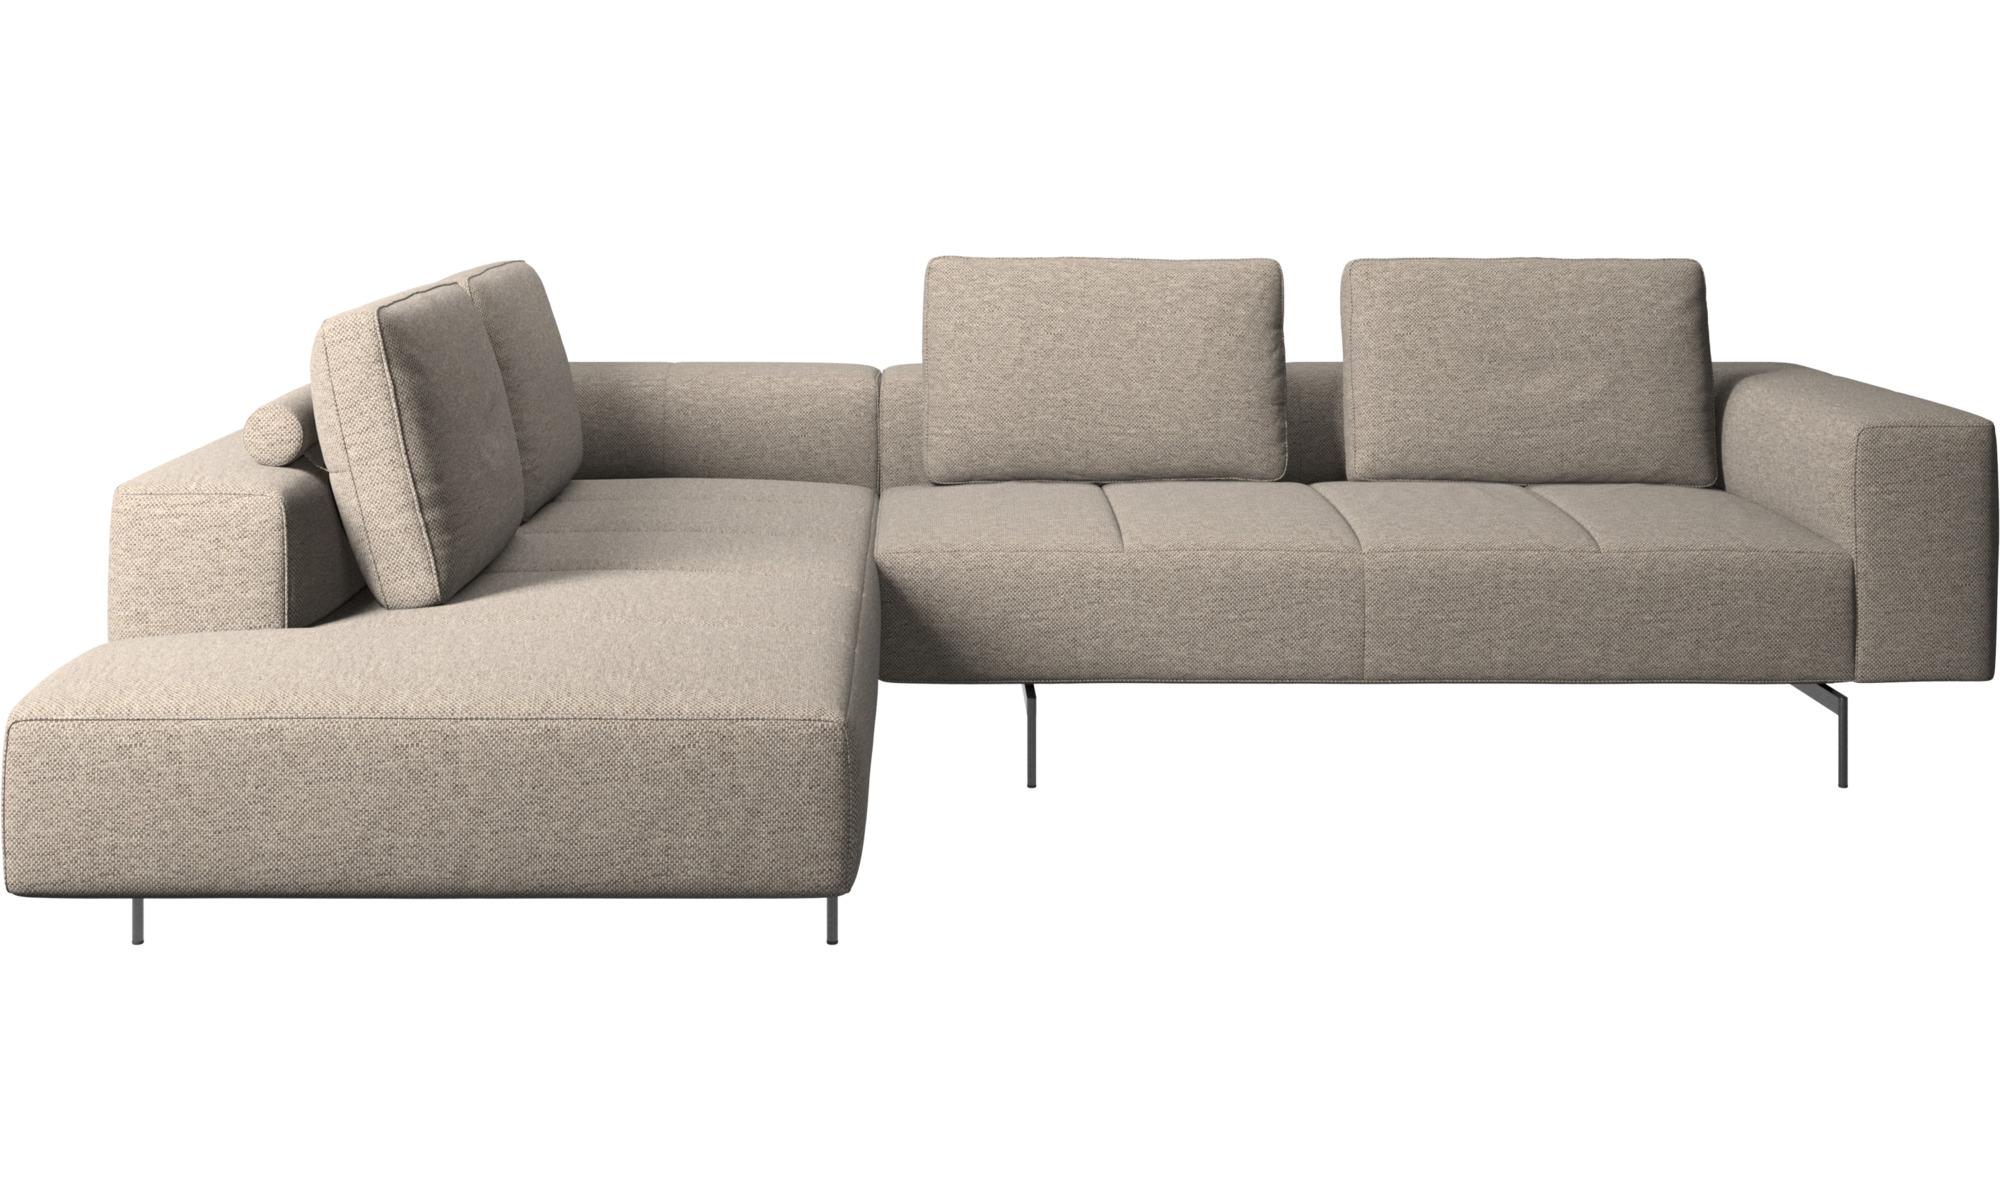 Modulare Sofas - Amsterdam Ecksofa mit Loungemodul - Beige - Stoff